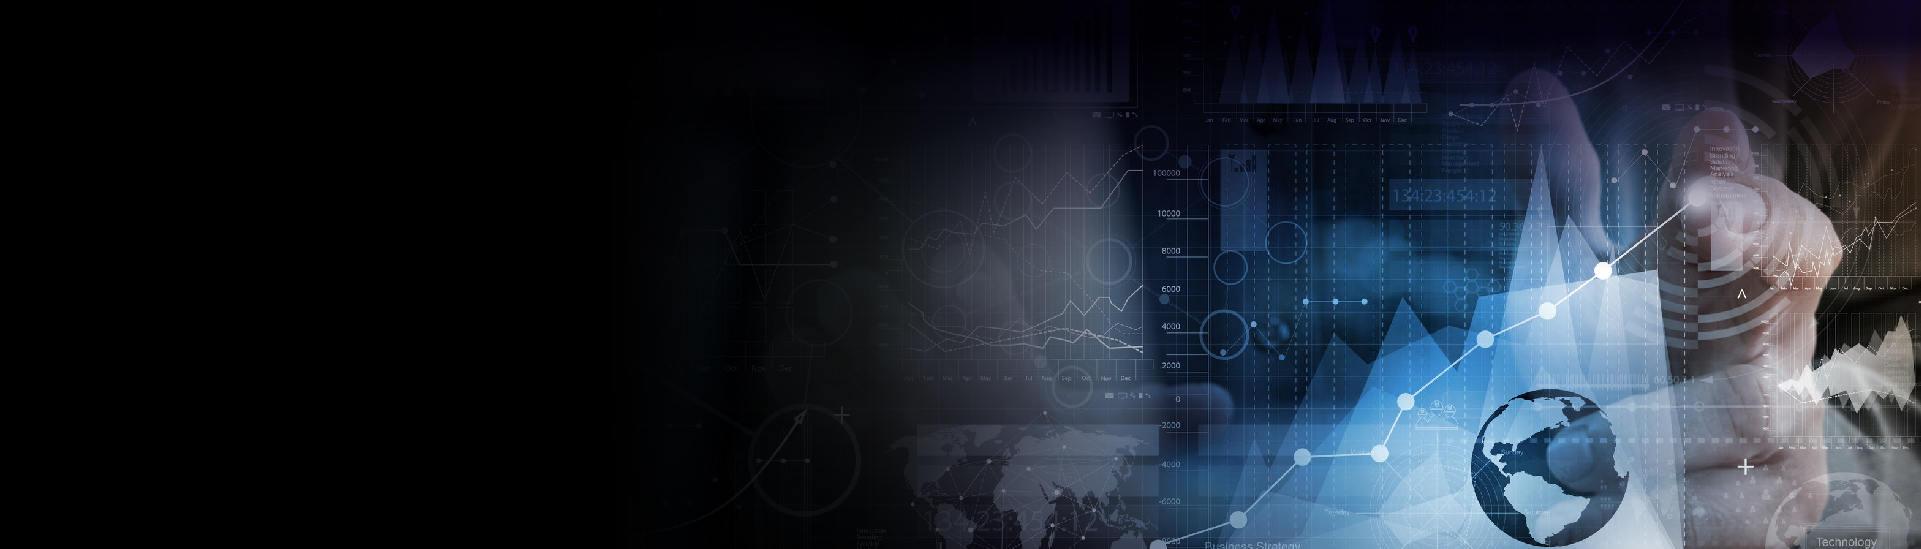 AnyShare 统一知识管理解决方案